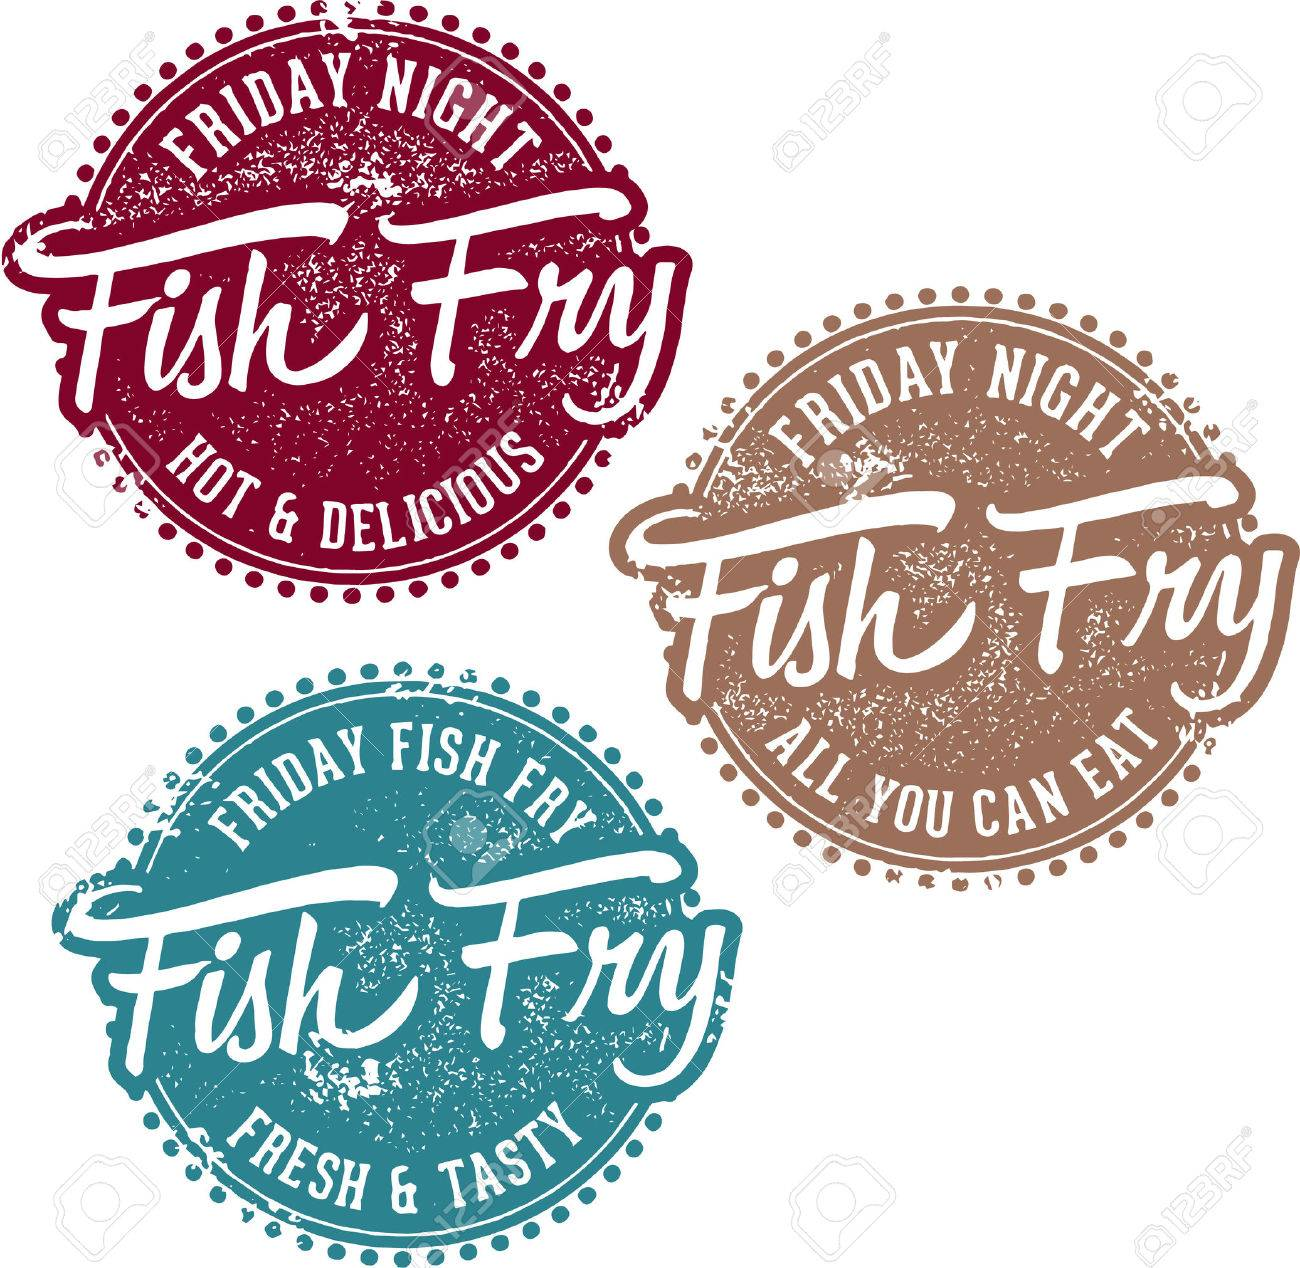 Friday Fish Fry - 42090841